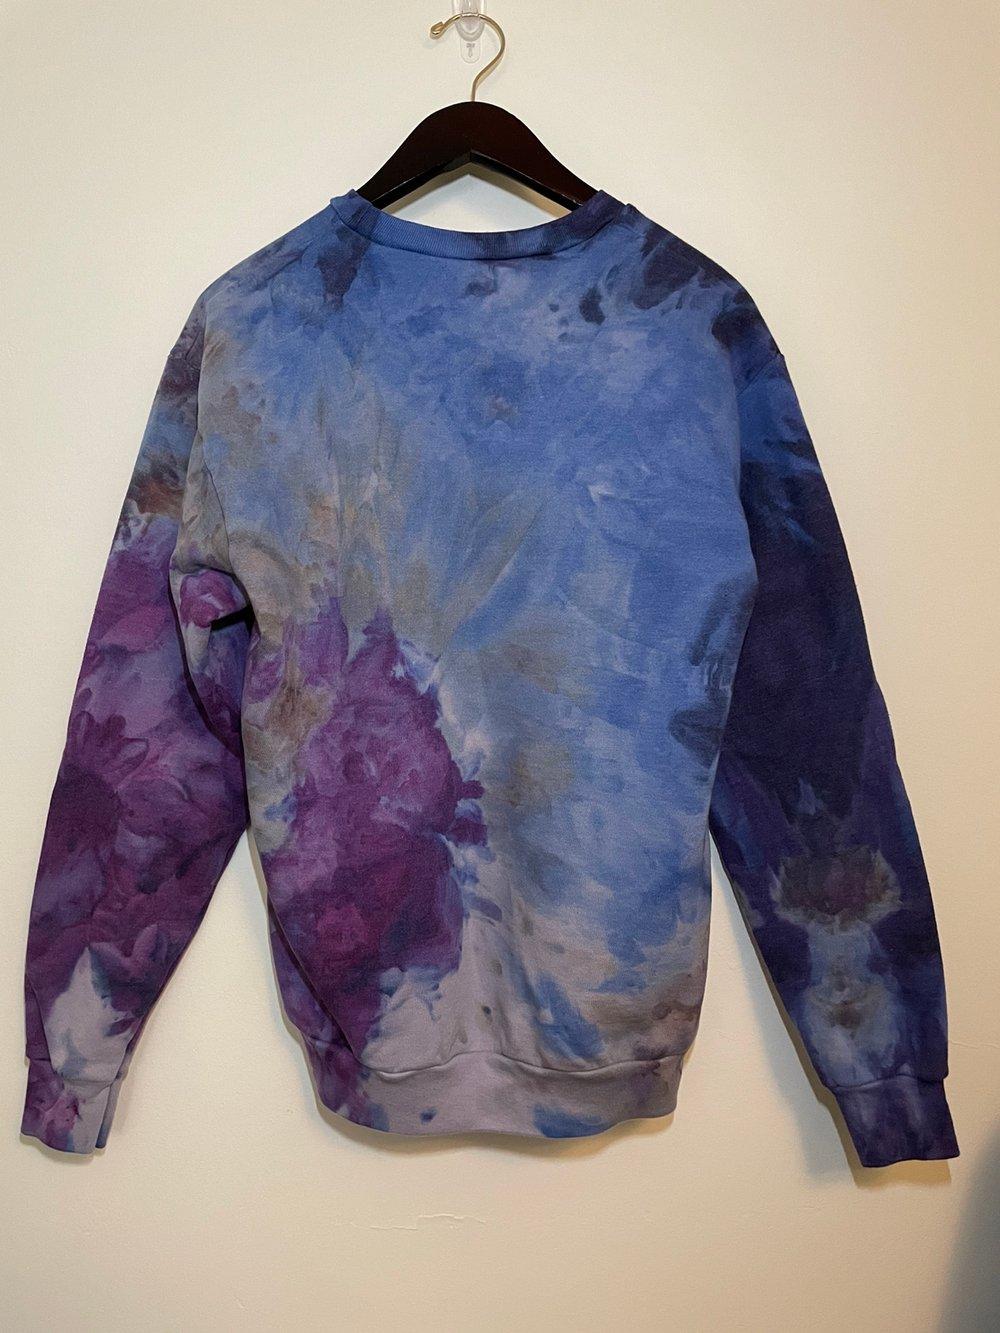 Tie-Dye Sweatshirt #5 - Medium